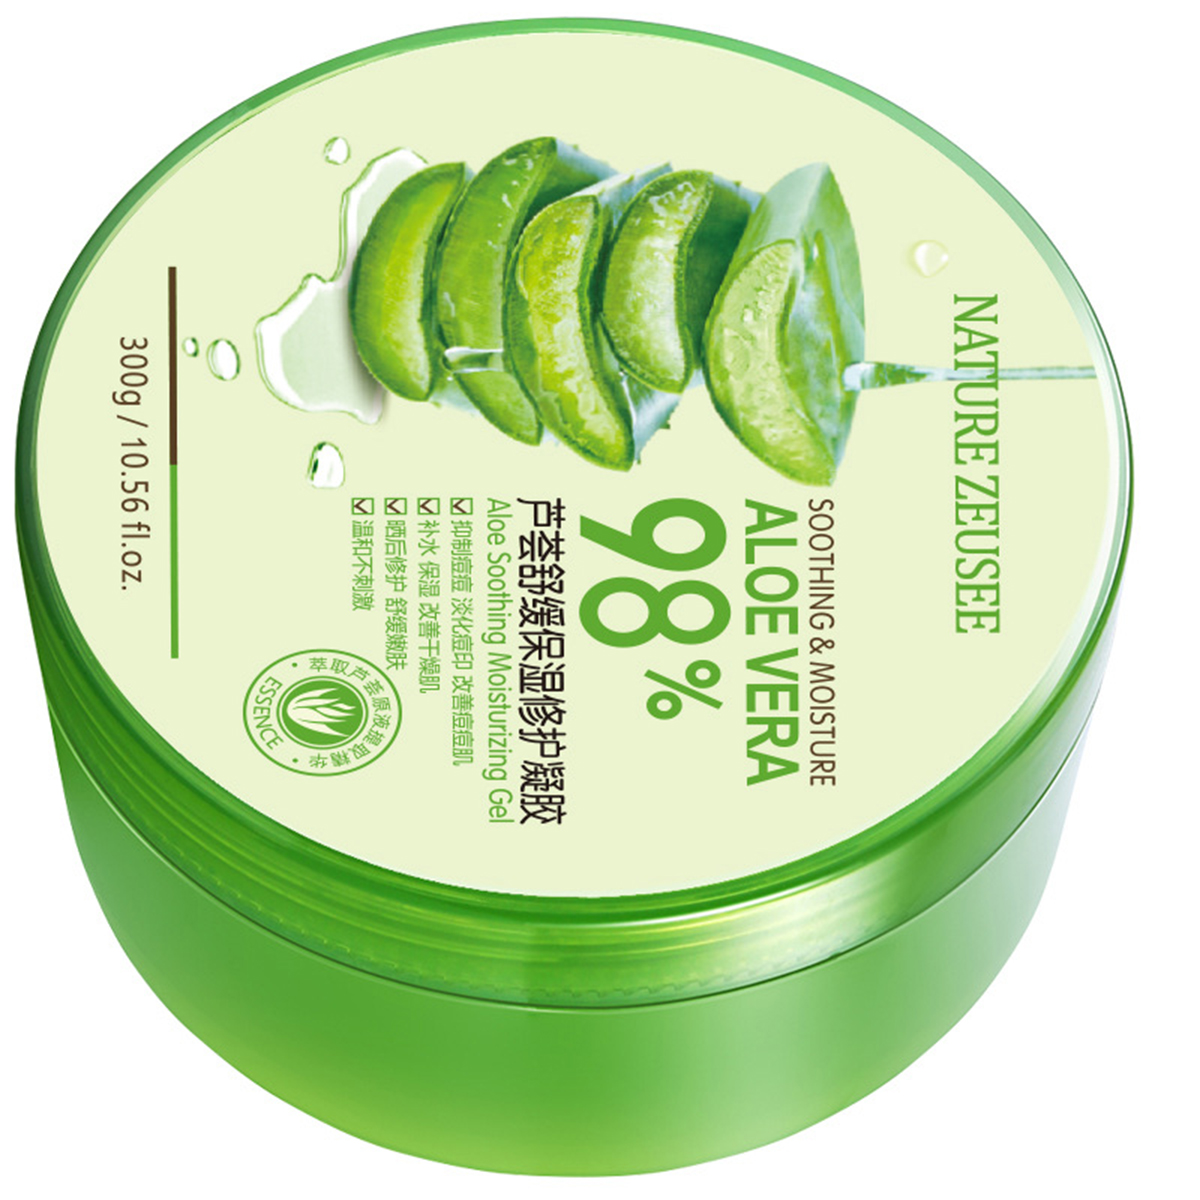 300g Nature Aloe Vera Gel Organic Oil-Control Face Skin Care Hydrating Repair Smoothing Moisturizing Gel Body Sunburn Relief